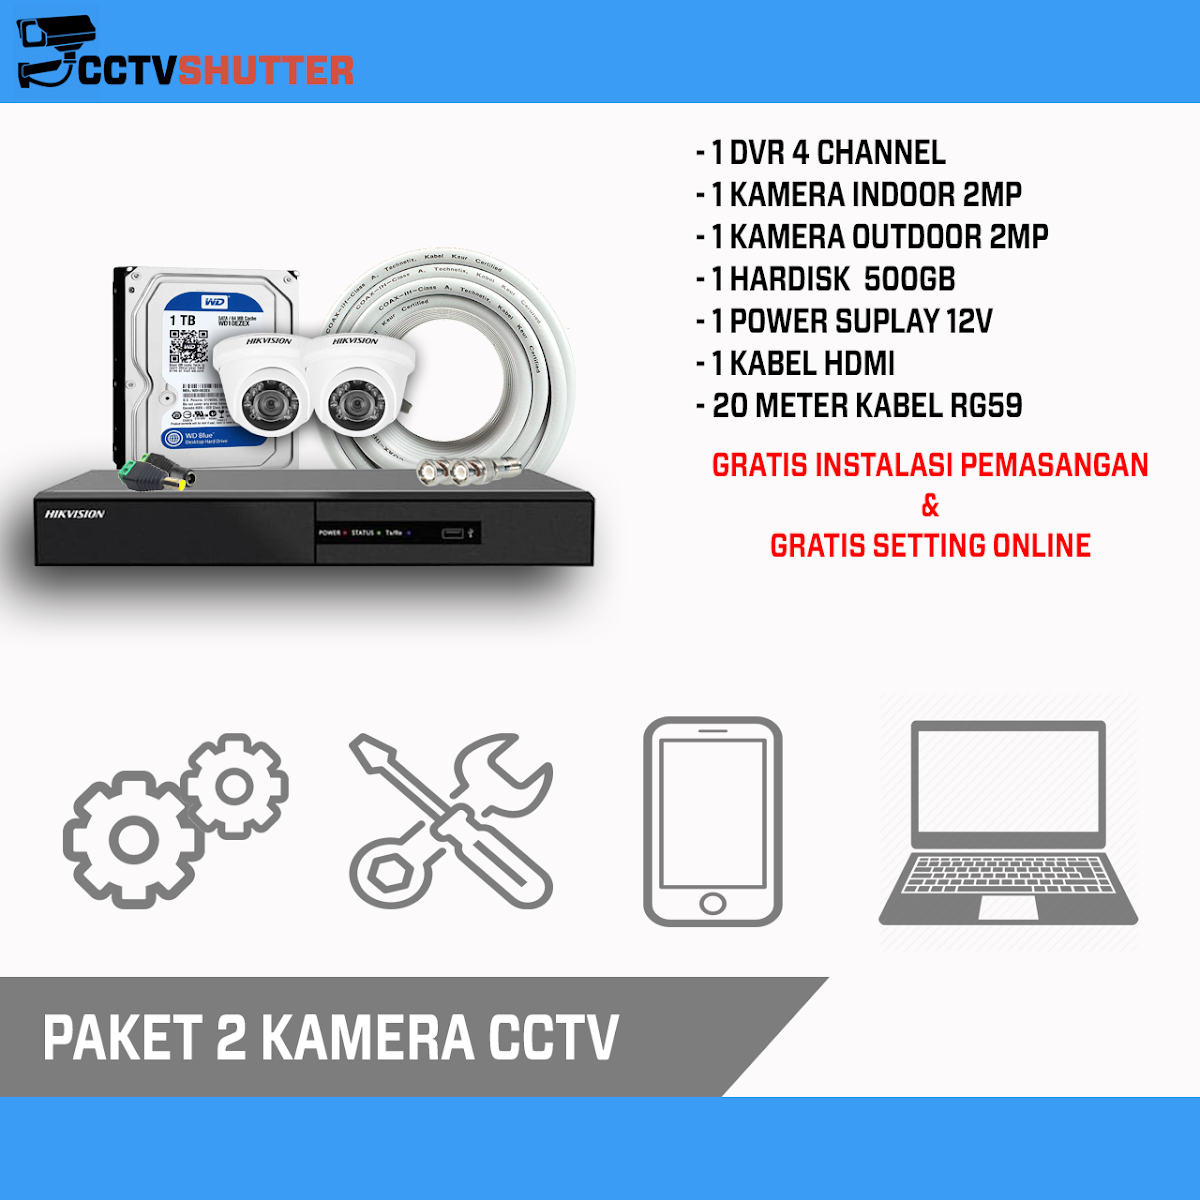 PASANG 4 KAMERA 2MP CCTV ONLINE MURAH